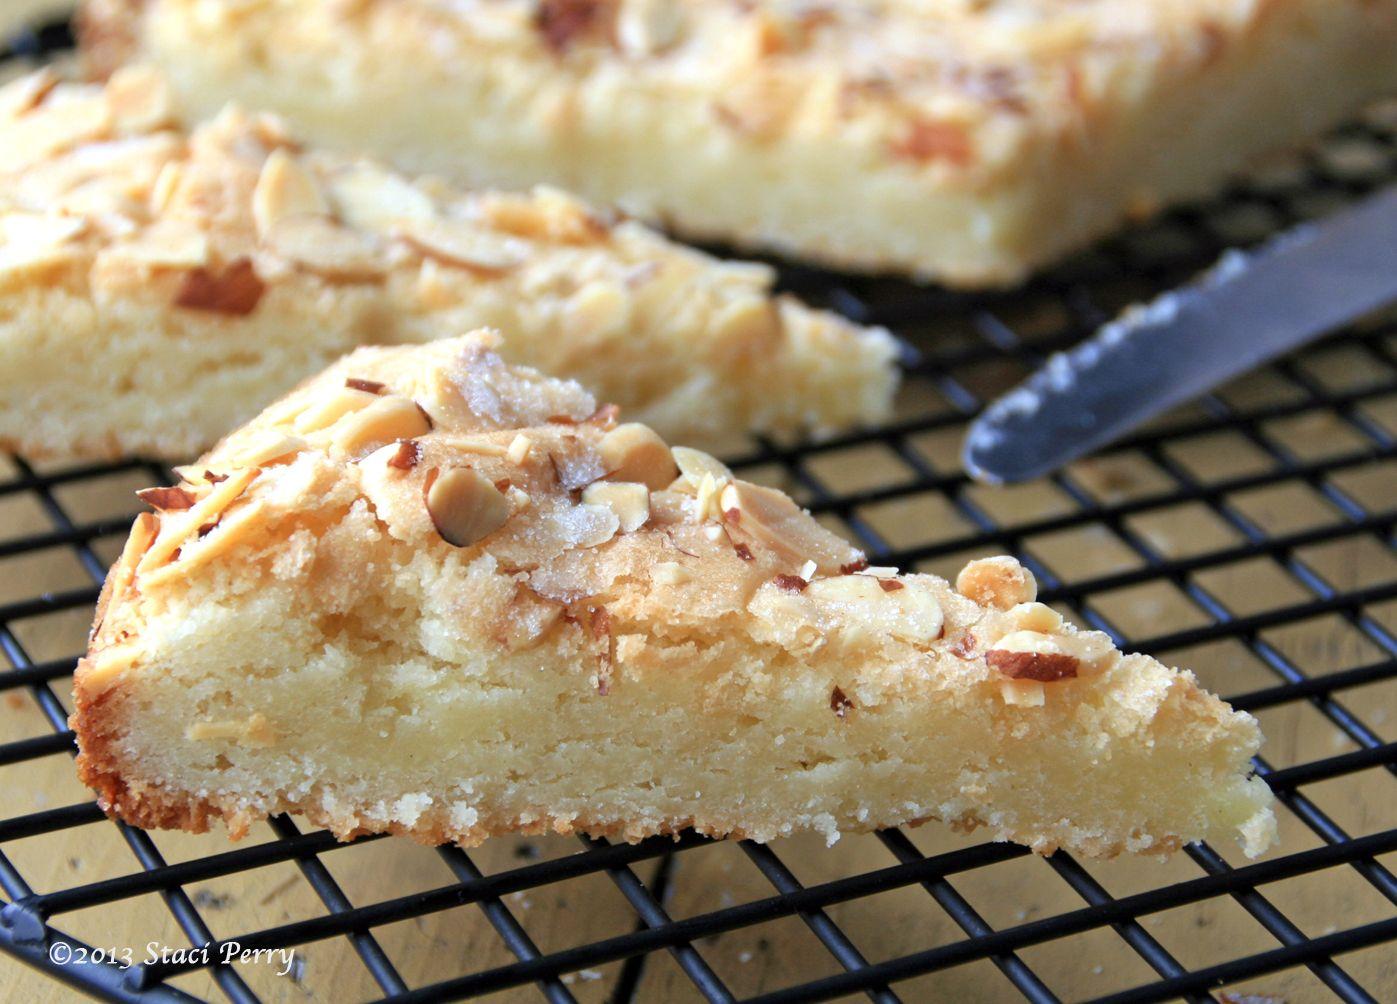 Its not my almond torte almond recipes almond torte